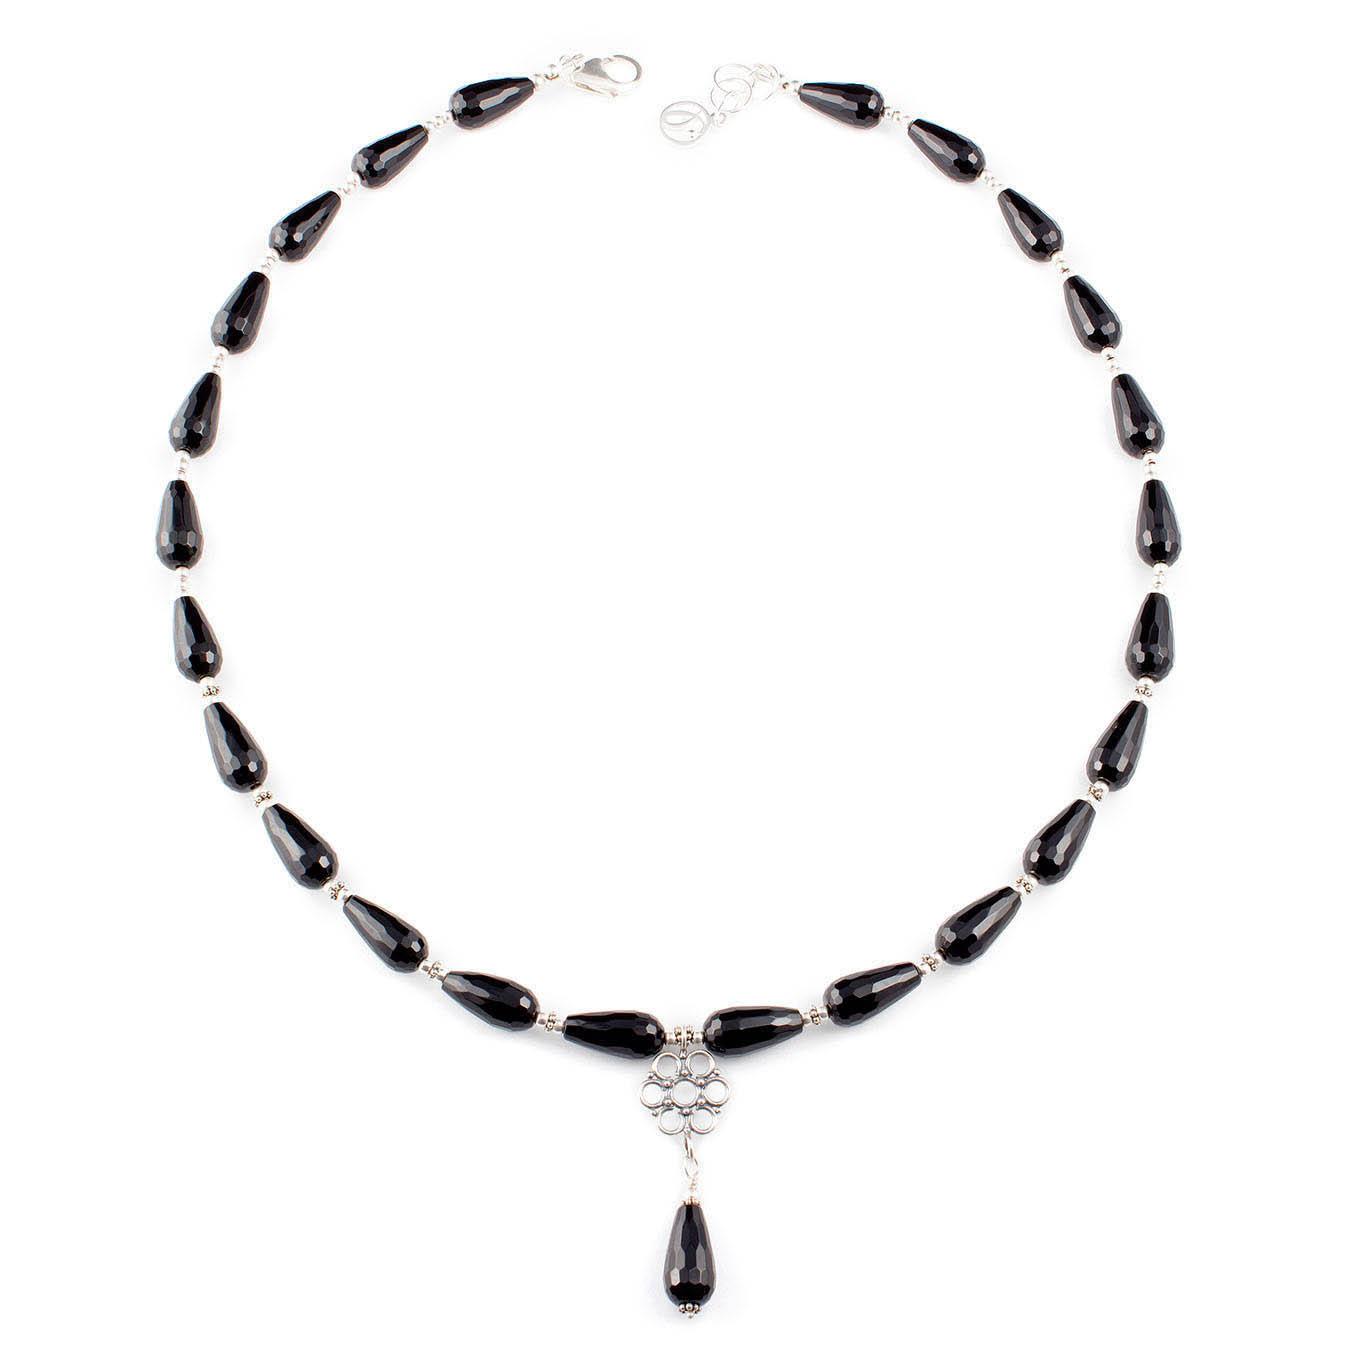 Handmade bali pendant  jewelry necklace made of teardrop black agate